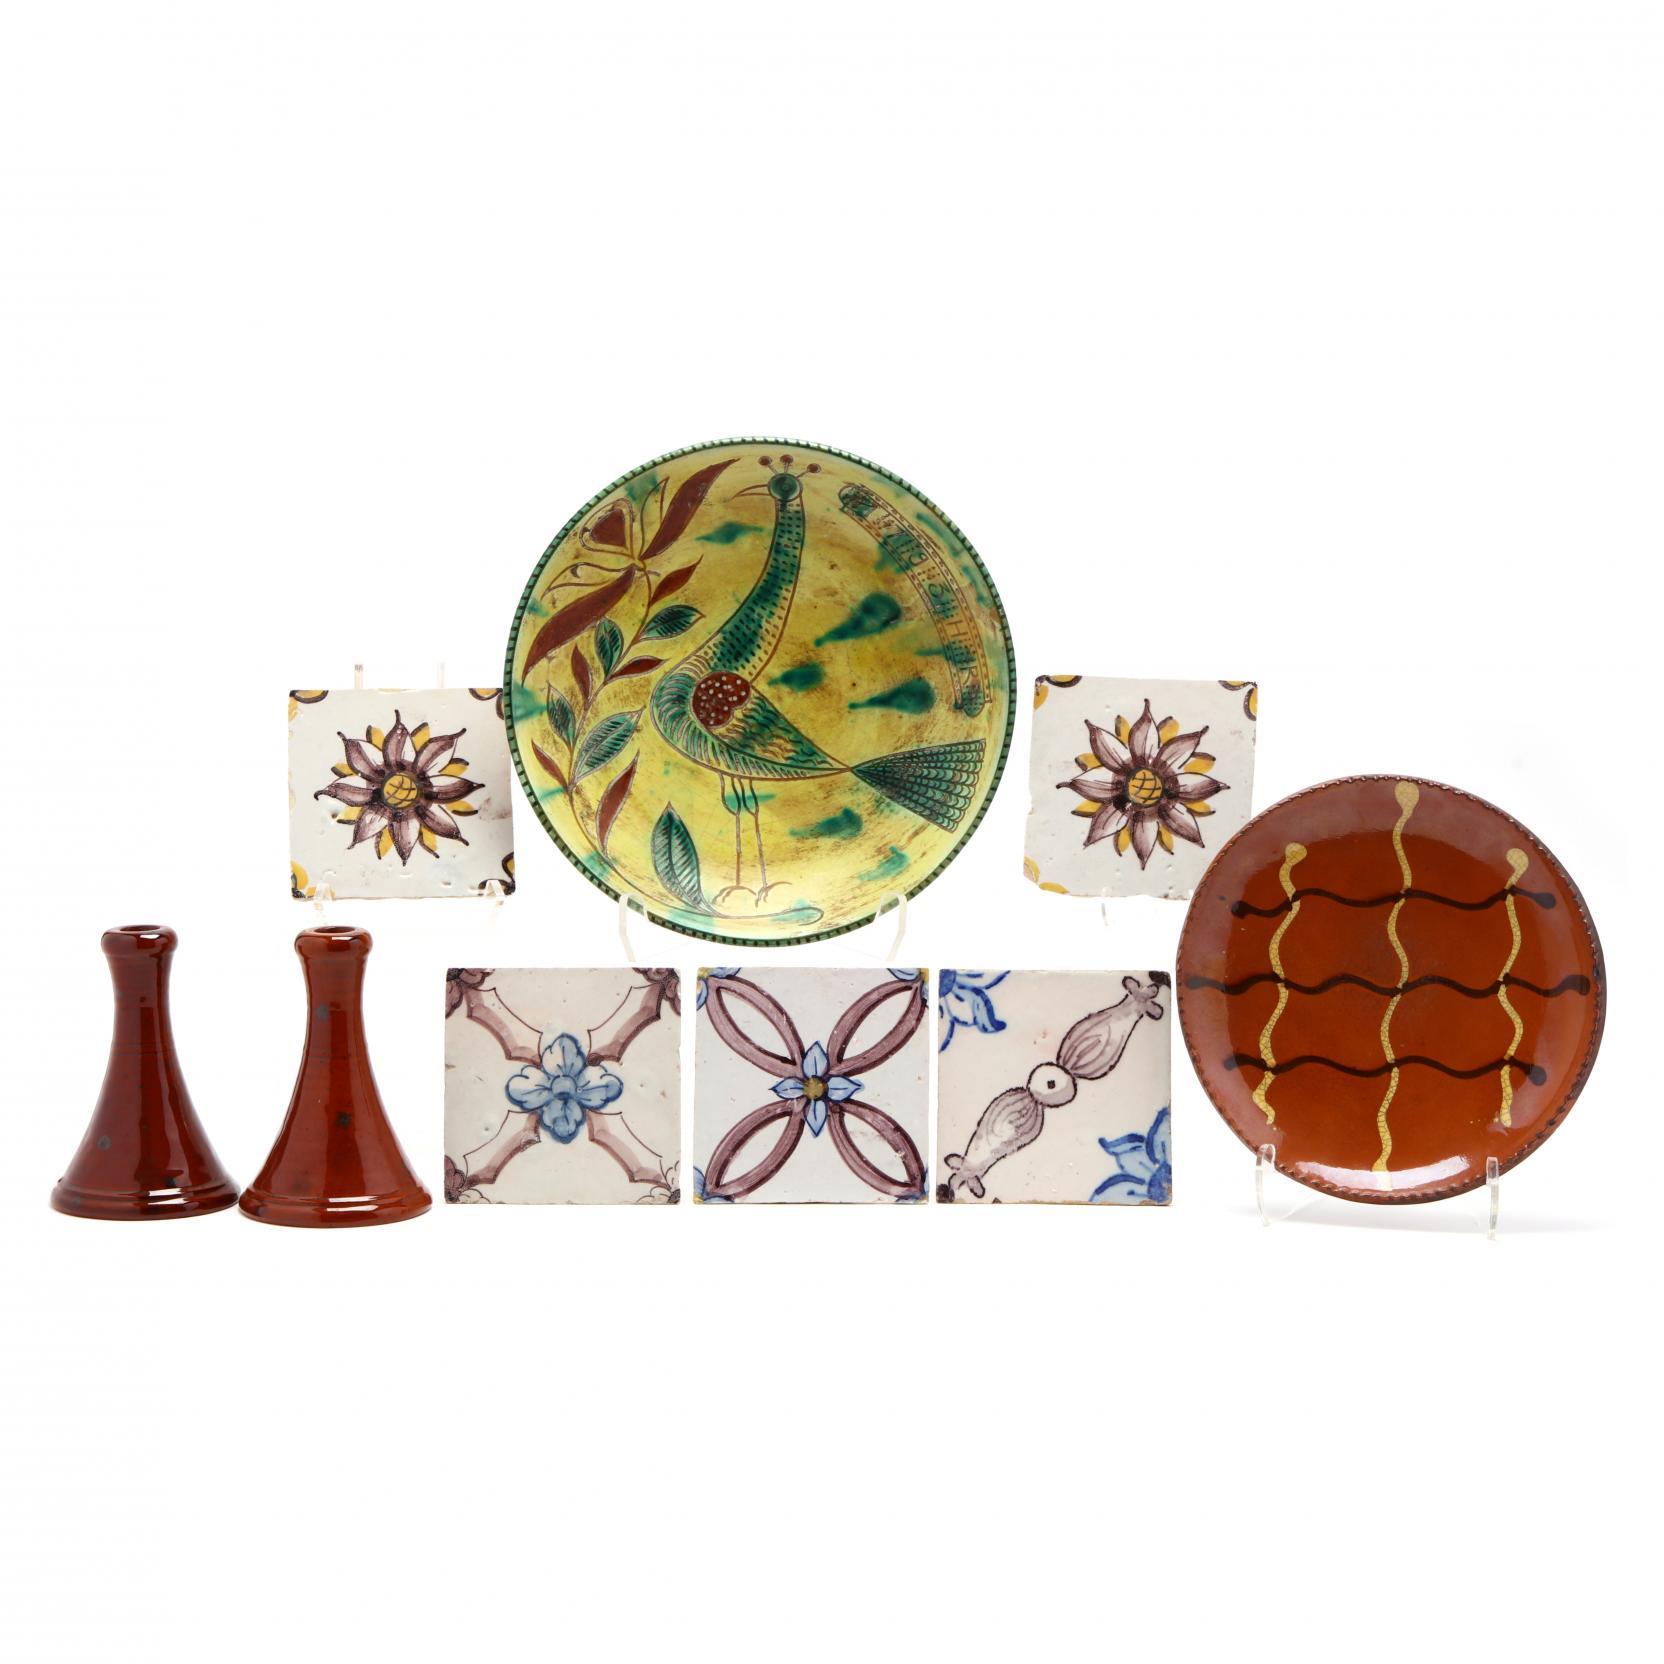 glaze-decorated-pottery-grouping